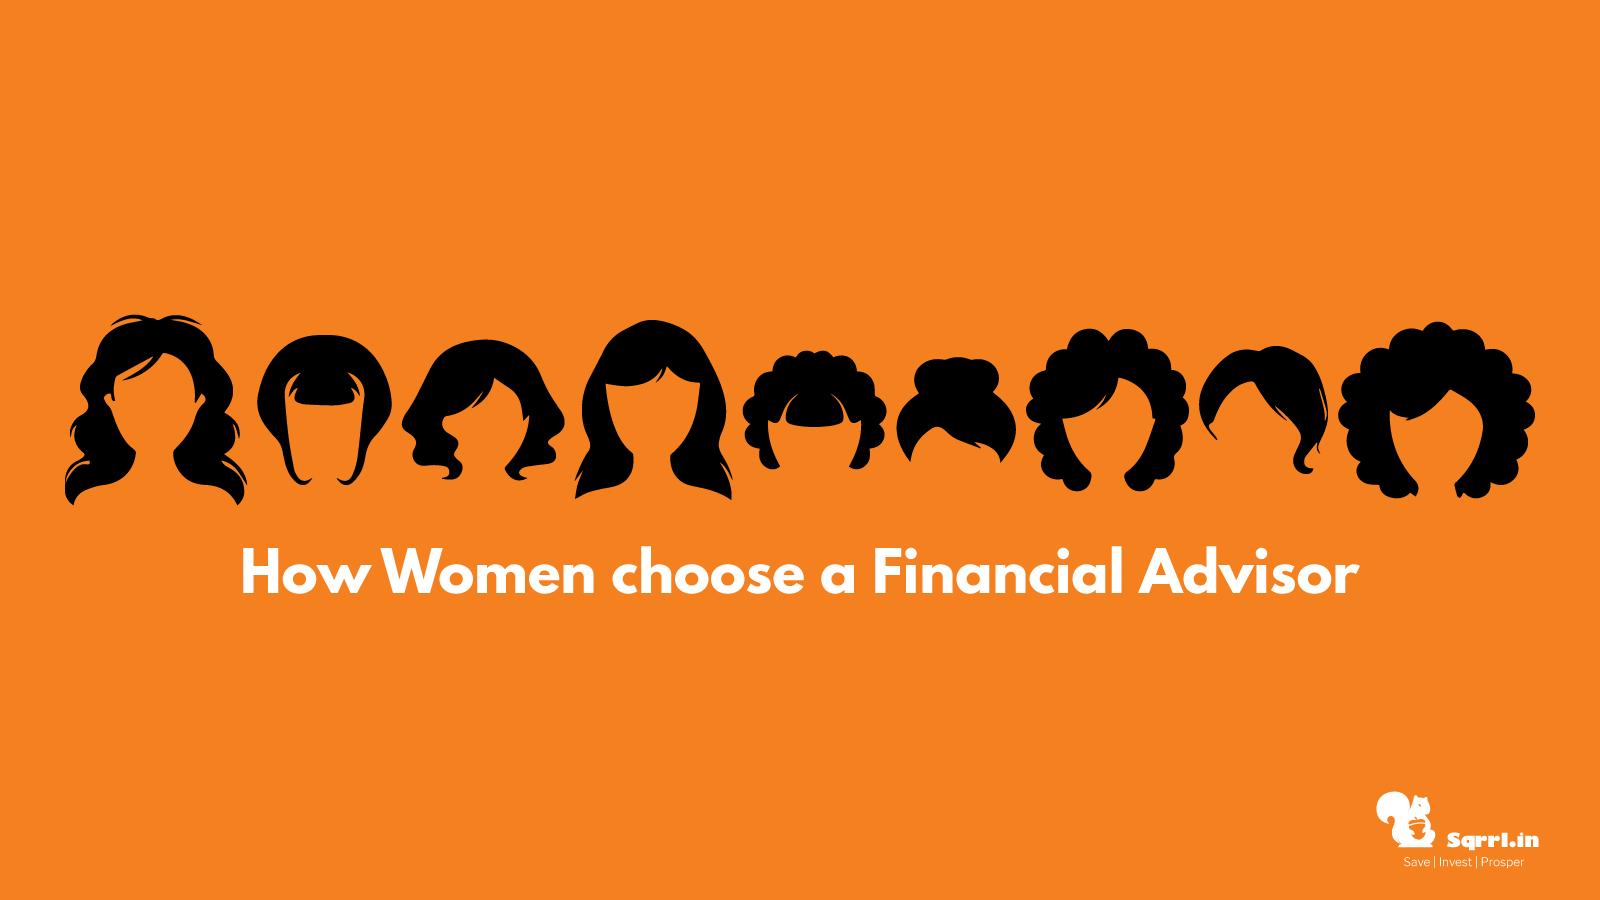 women-choose-a-financial-advisor